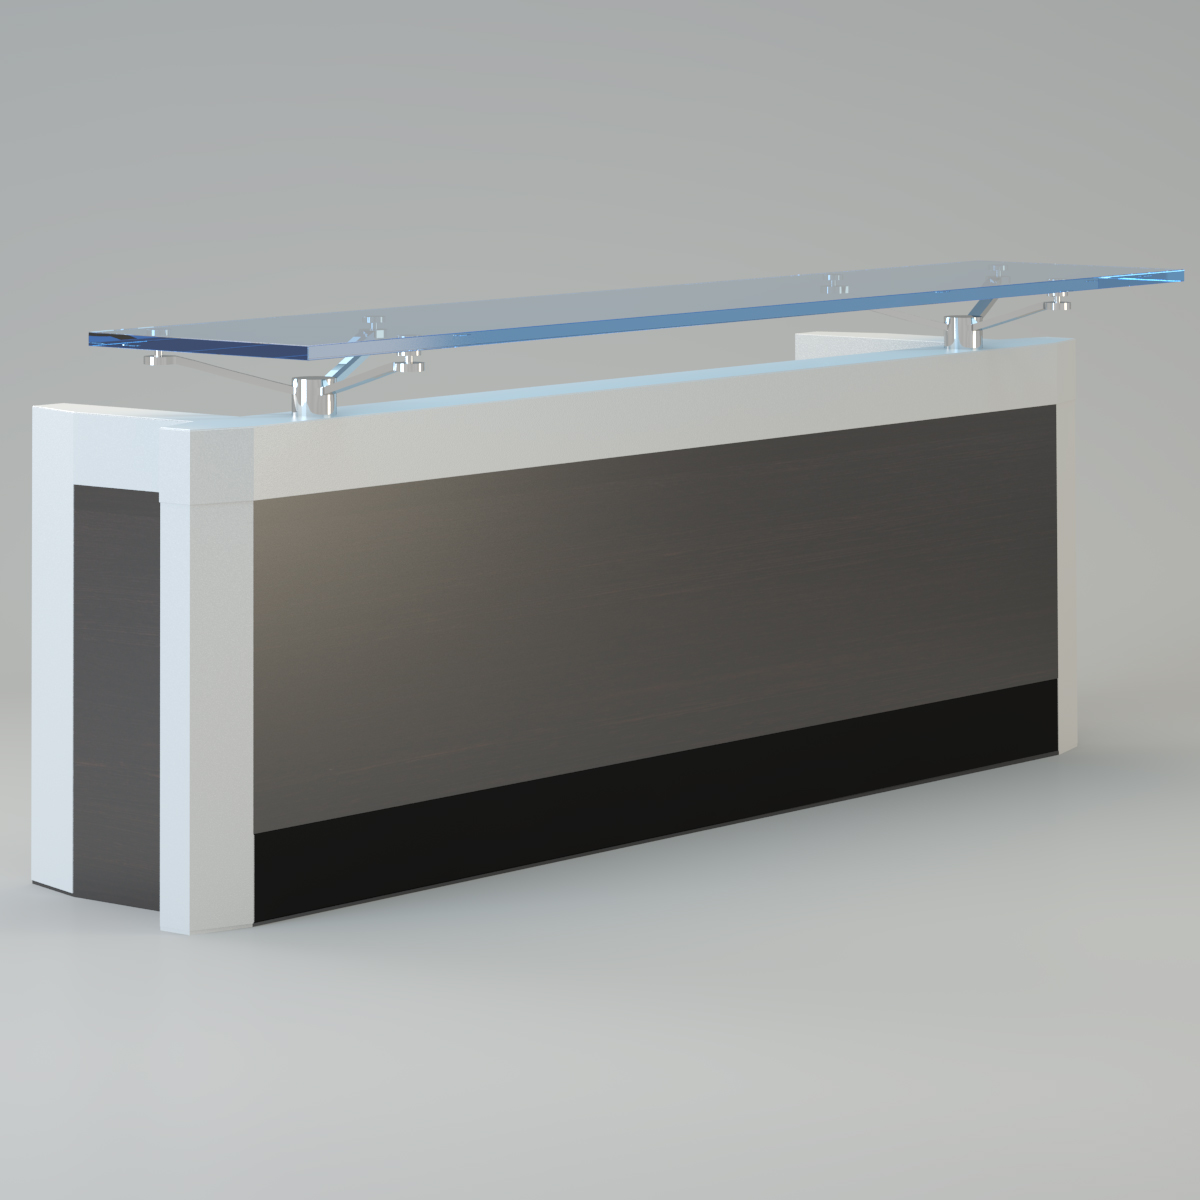 front desk furniture design. Contemporary Reception Desk 3d Model Max 3 Front Furniture Design